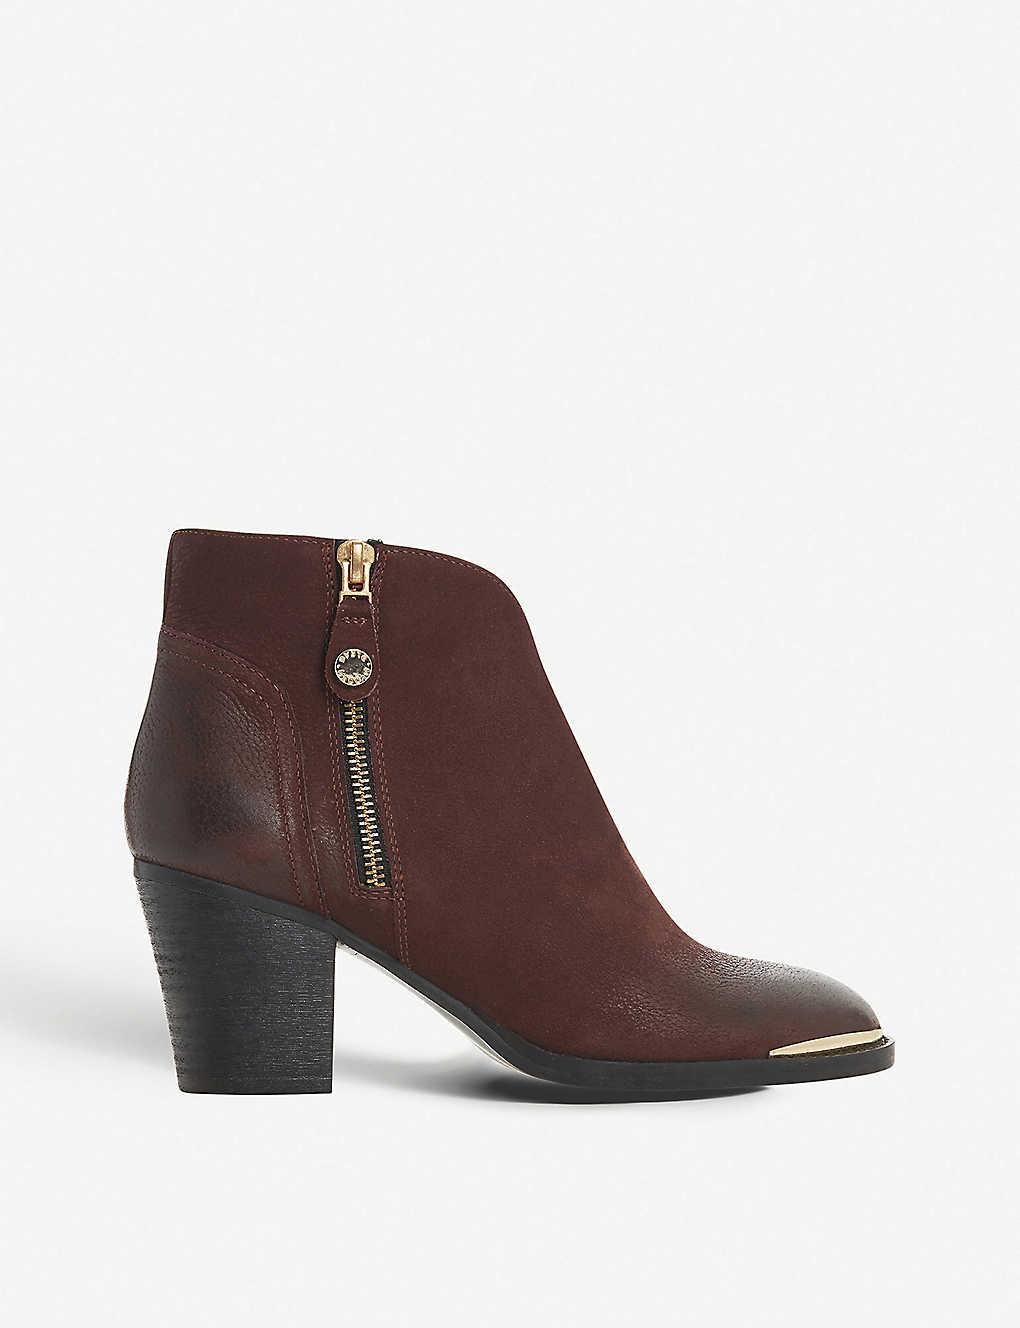 24e74c3bac17b STEVE MADDEN - Francy leather ankle boots   Selfridges.com